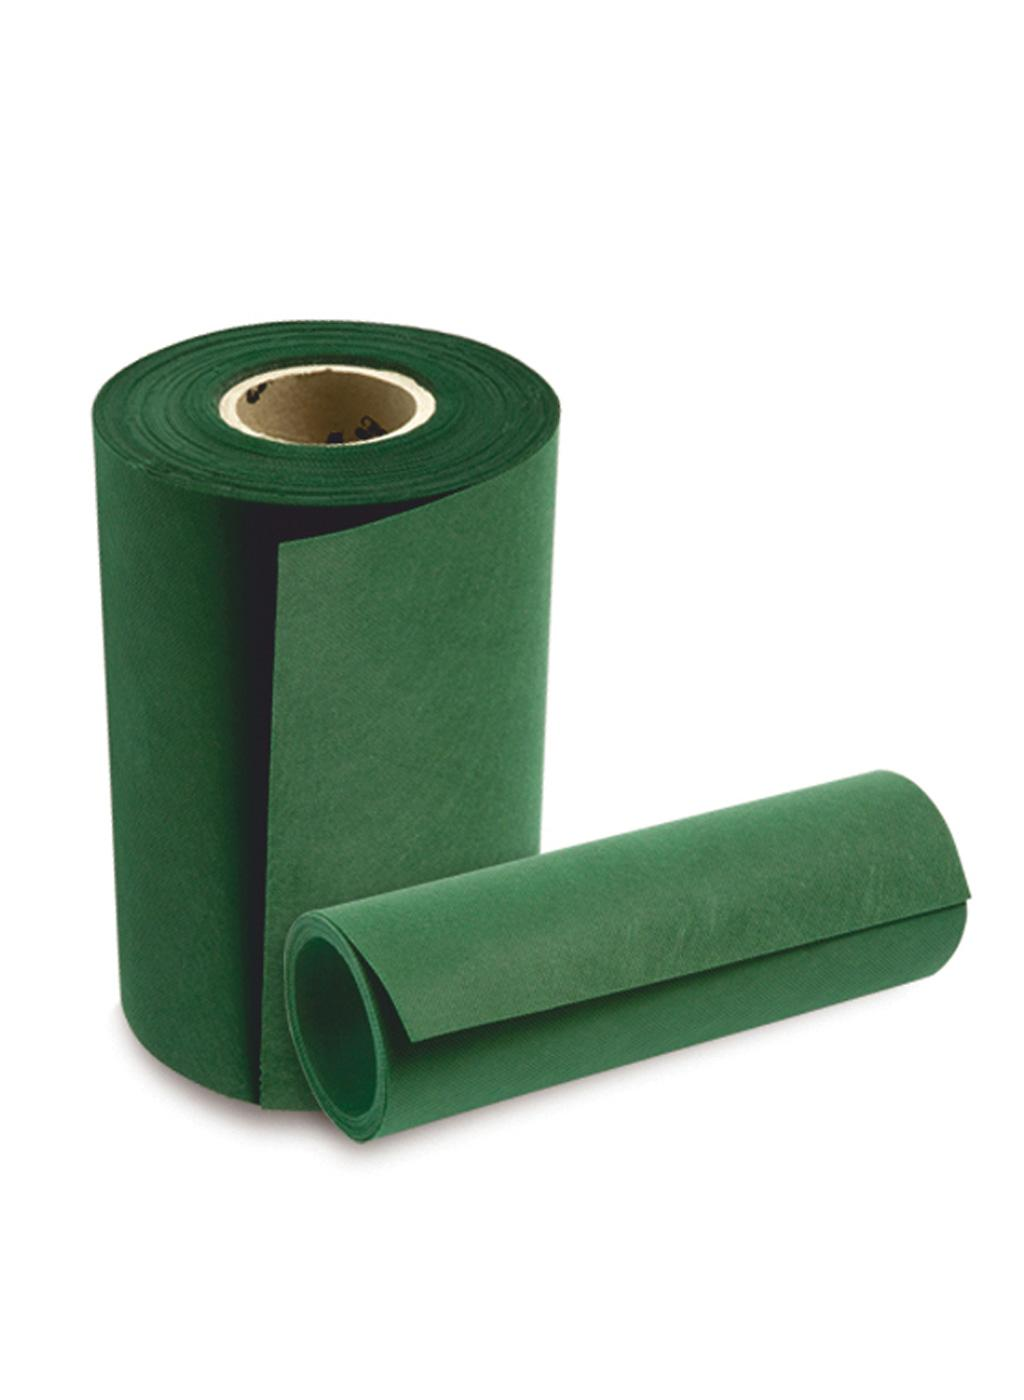 banda union cesped artificial 0.3 x 50 verde